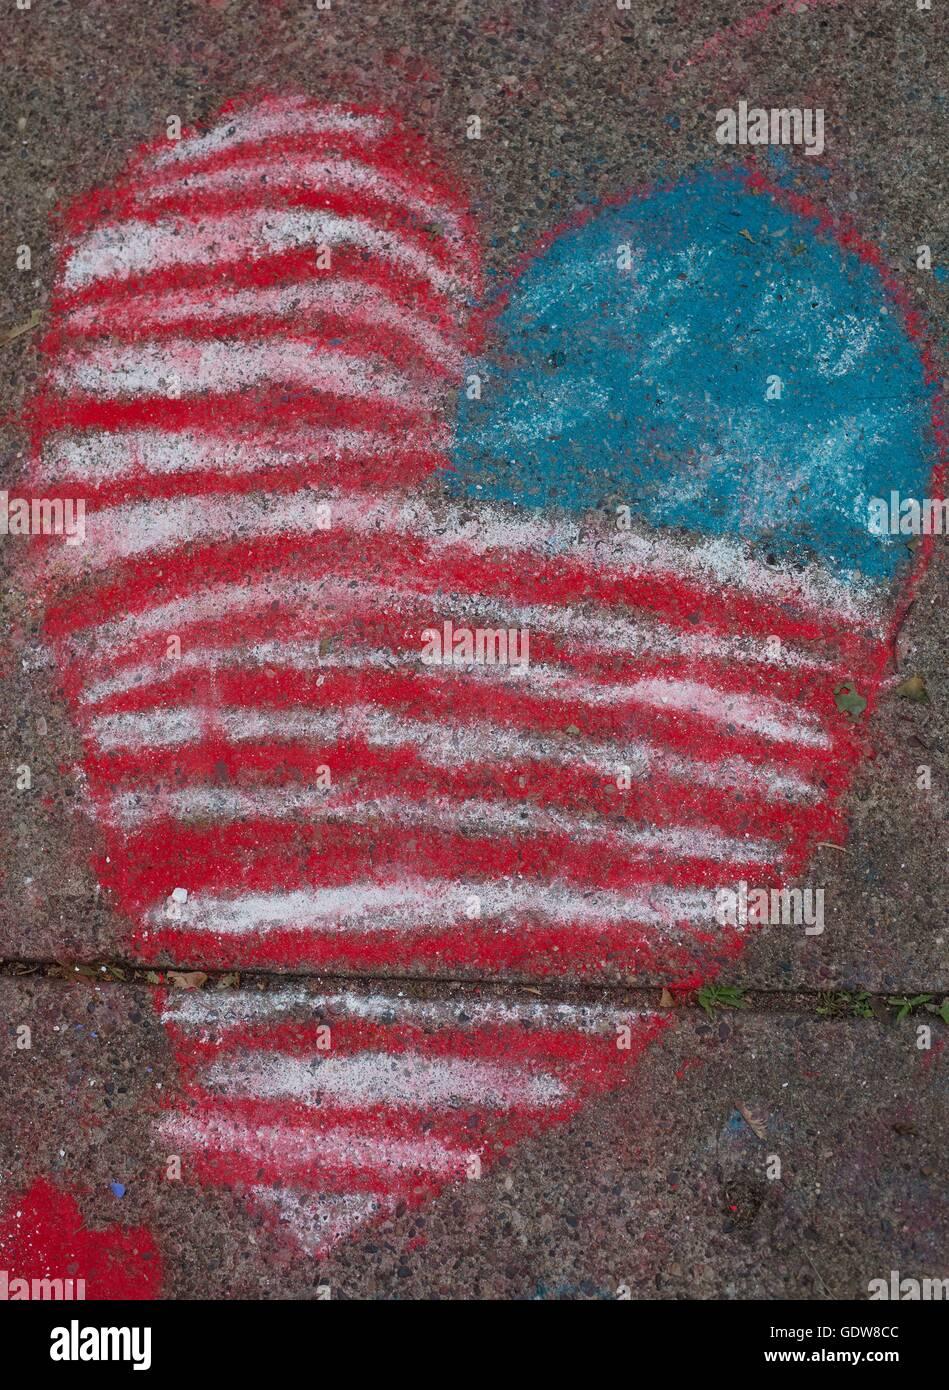 A sidewalk chalk drawing of an American flag inside a heart. - Stock Image